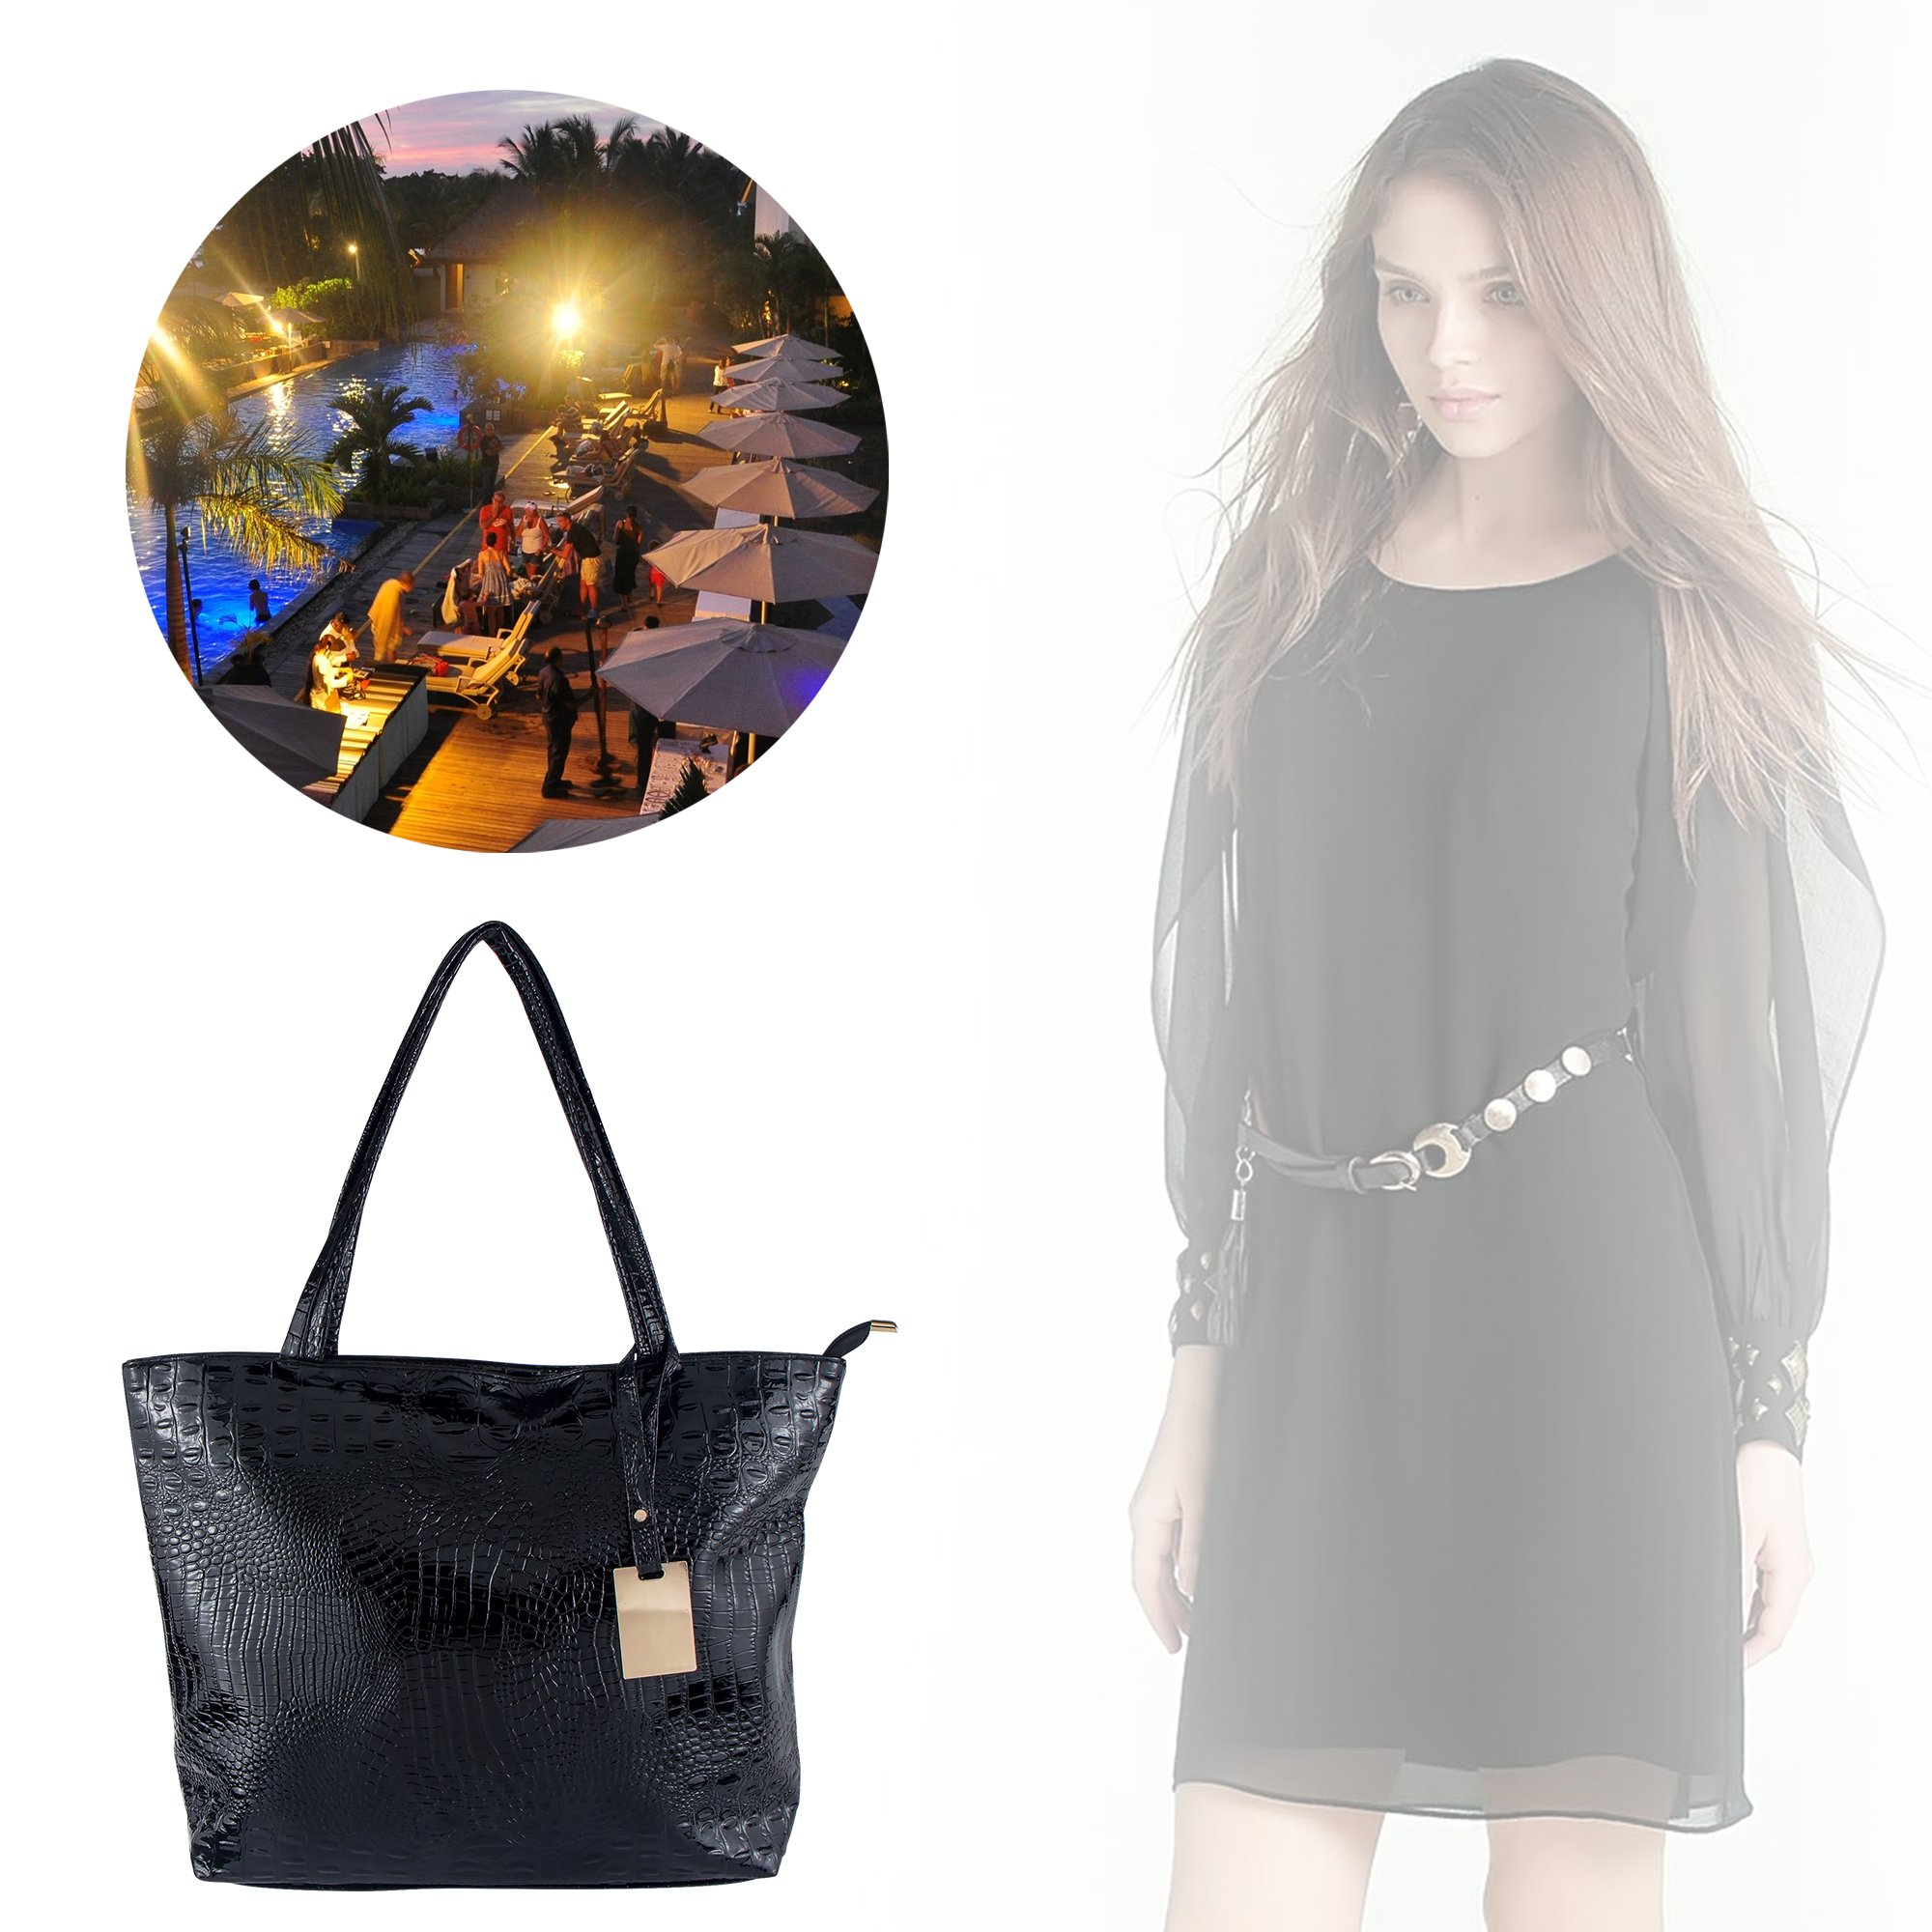 Bagood Womens Crocodile Pattern PU Leather Casual Shopping Handbags High Capacity Shoulder Ladies Soft Bag for Wedding Bridal Prom Party Black by Bagood (Image #2)